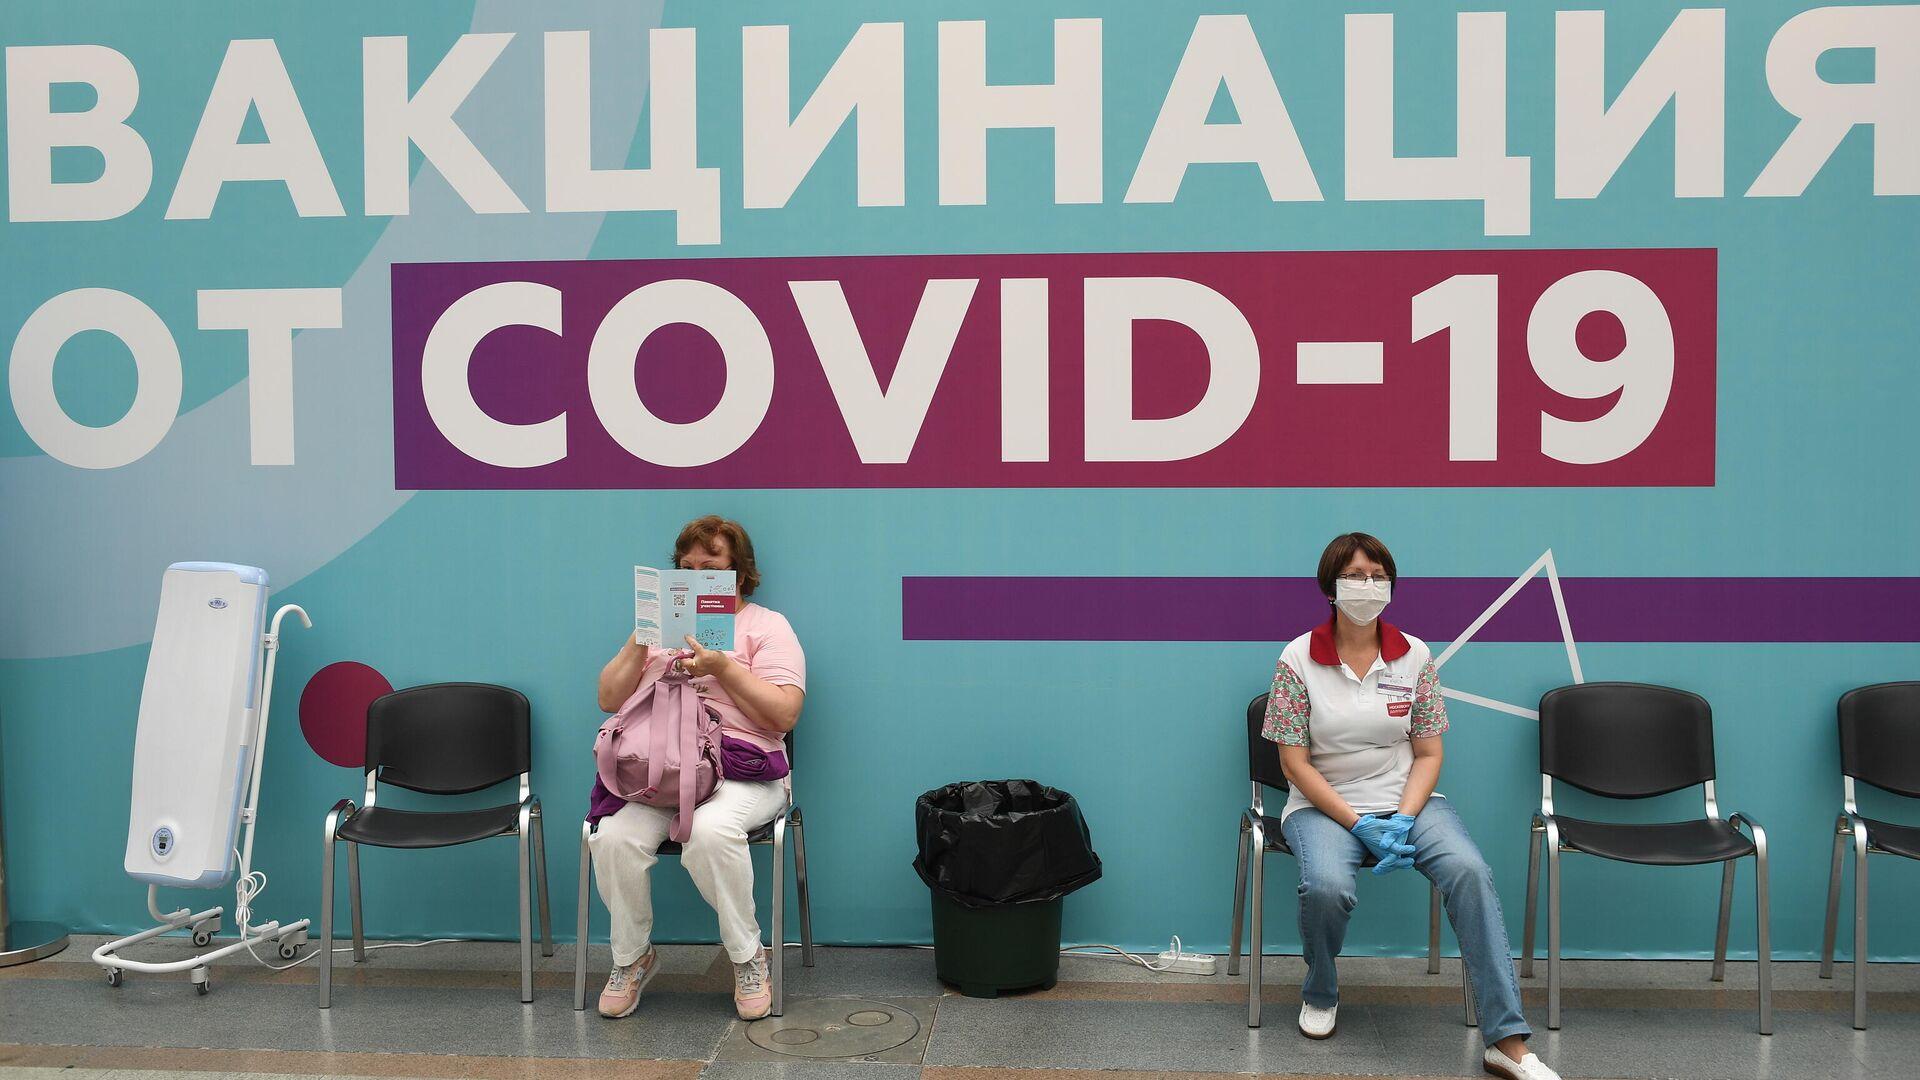 Посетители в центре вакцинации от COVID-19 в Гостином дворе в Москве - РИА Новости, 1920, 10.08.2021